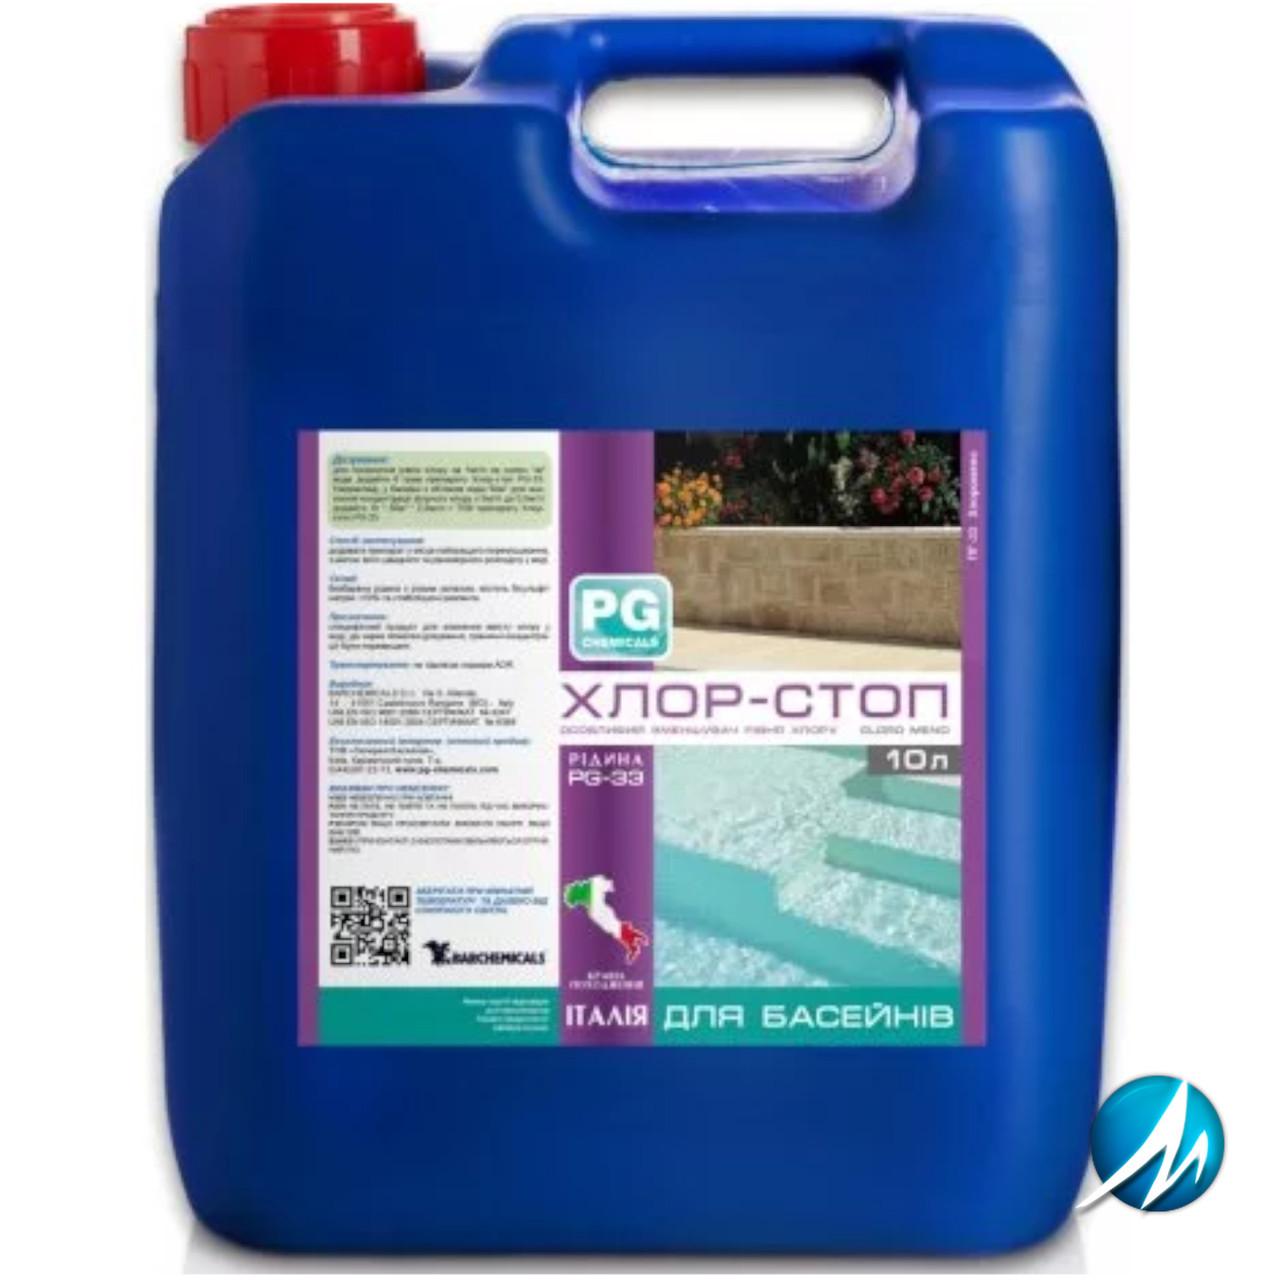 Barchemicals хлор - стоп 10 л